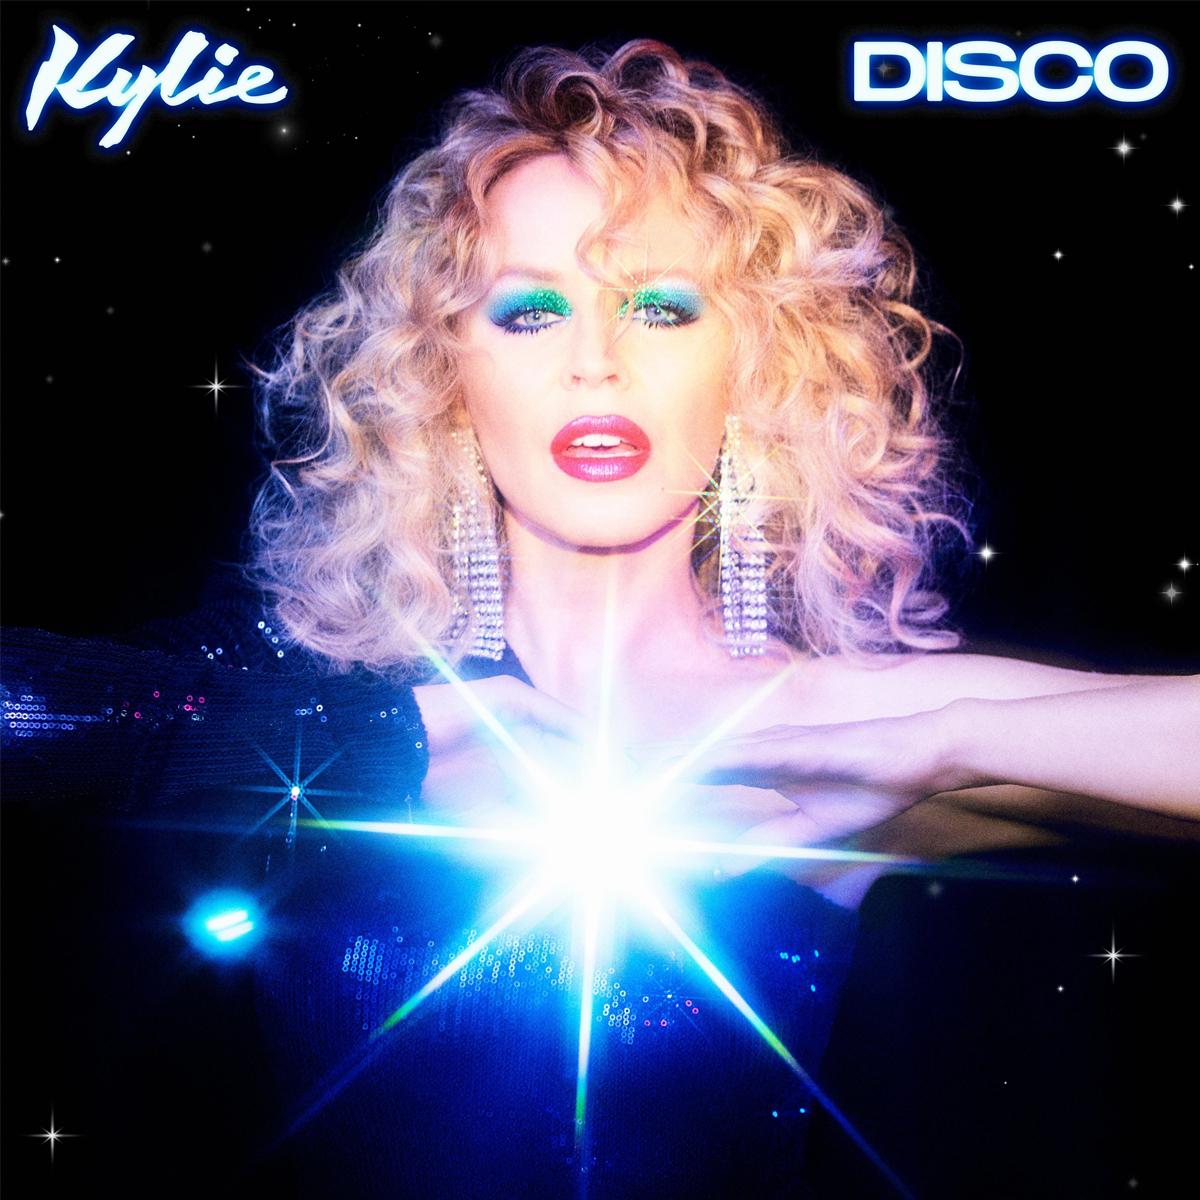 Kylie Minogue new album Disco